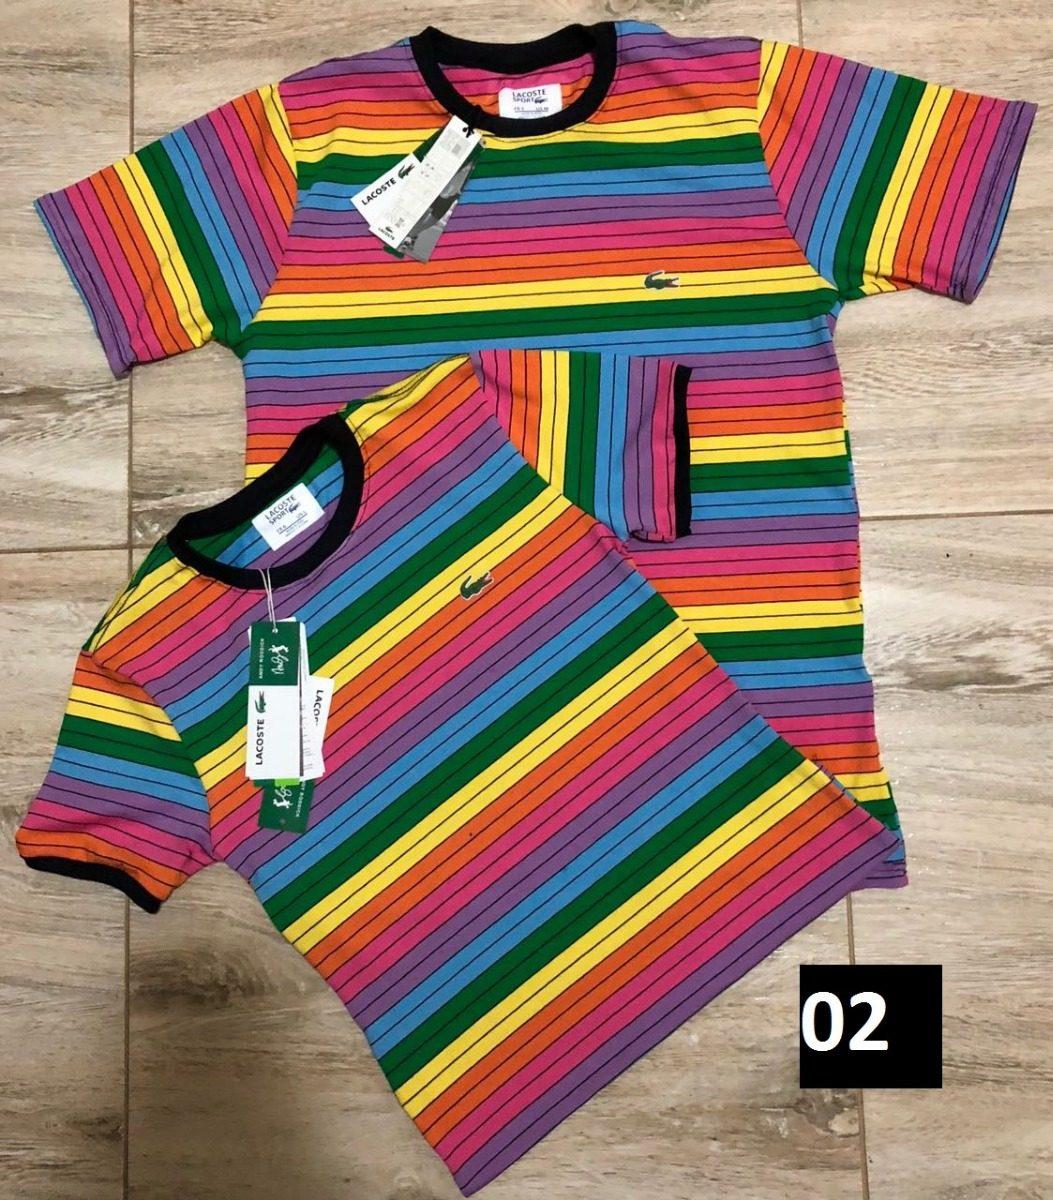 019230cfc48eb camiseta masculina lacoste original distribuidora oficial. Carregando zoom.